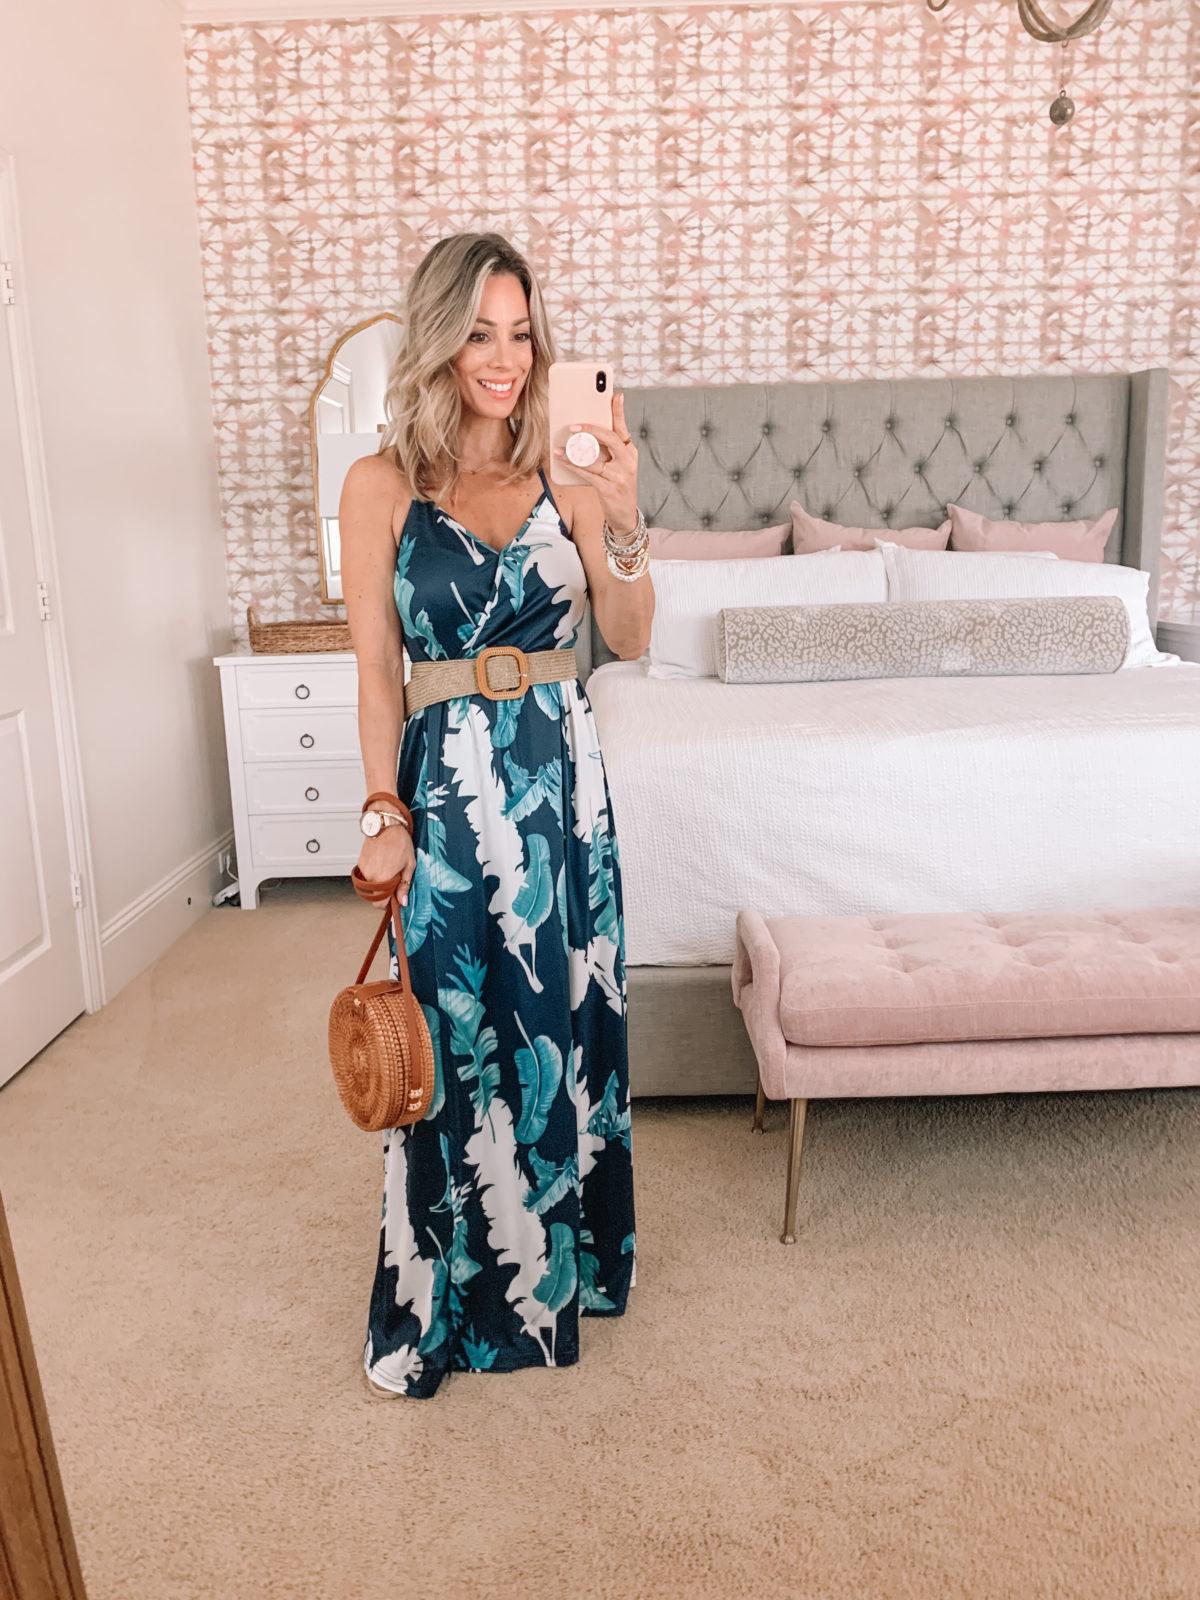 Amazon Fashion Faves, Floral Maxi Dress, Woven Belt, Crossbody